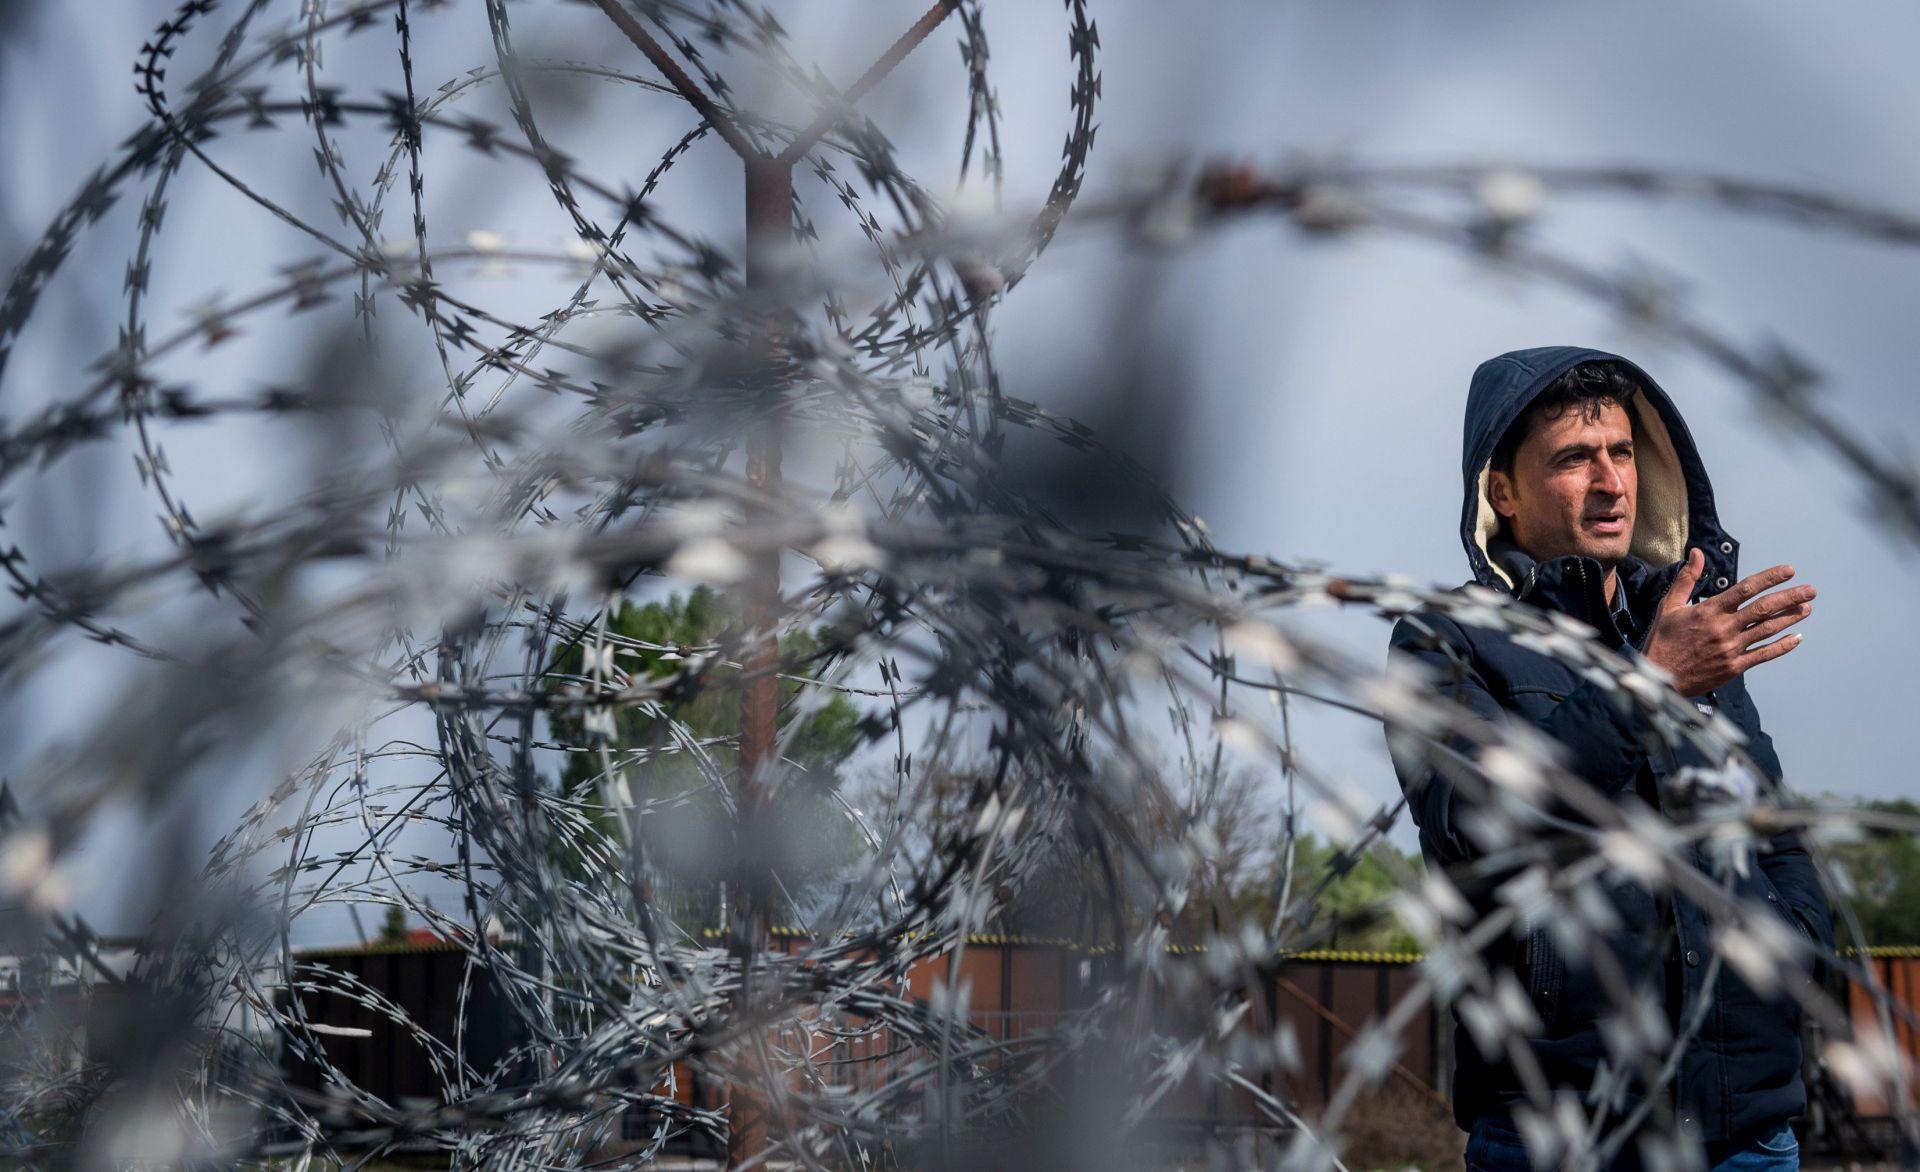 Mađarska brani protuimigrantska stajališta pred UN-om